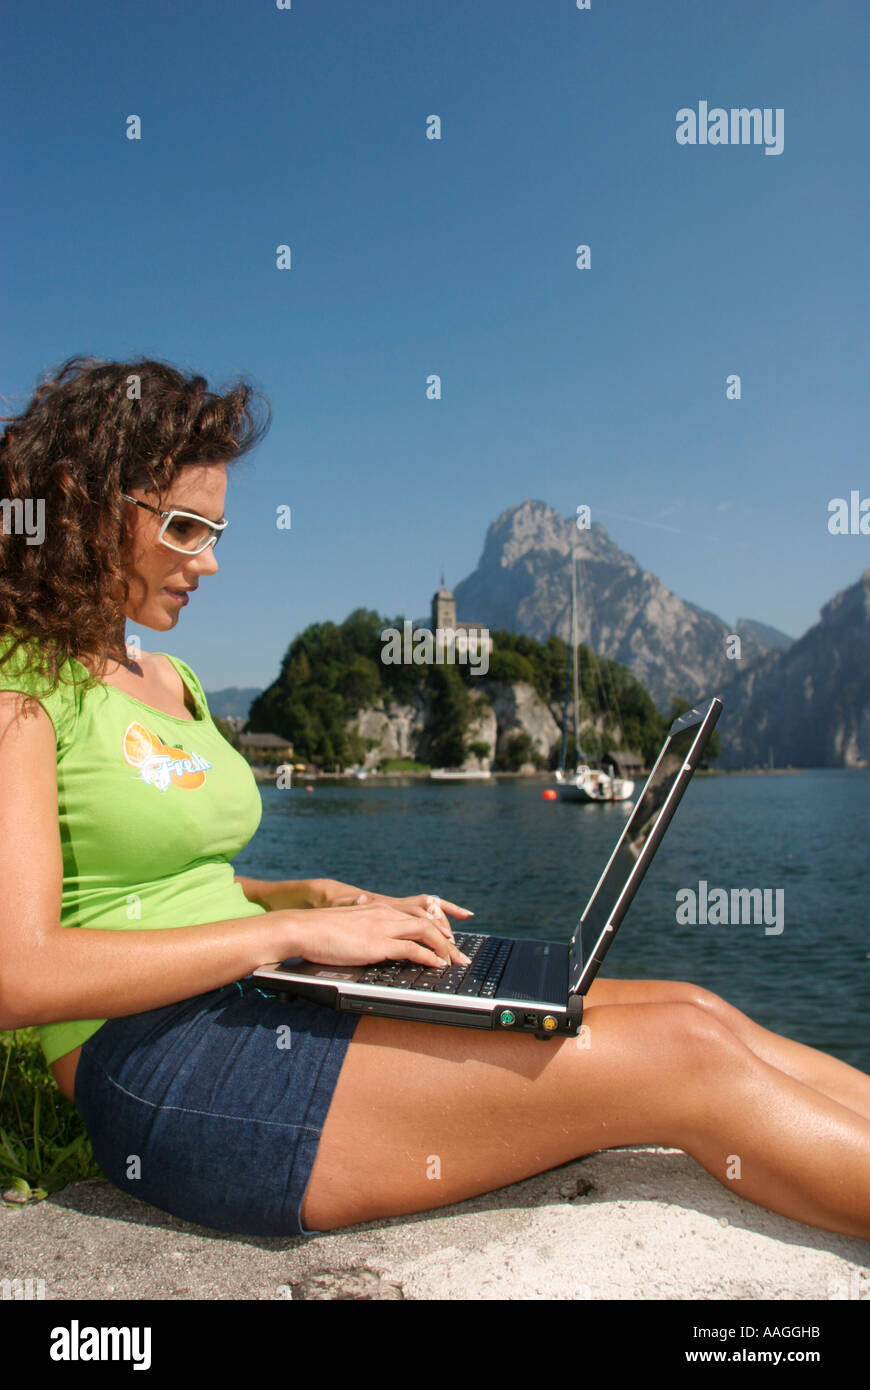 people - Stock Image